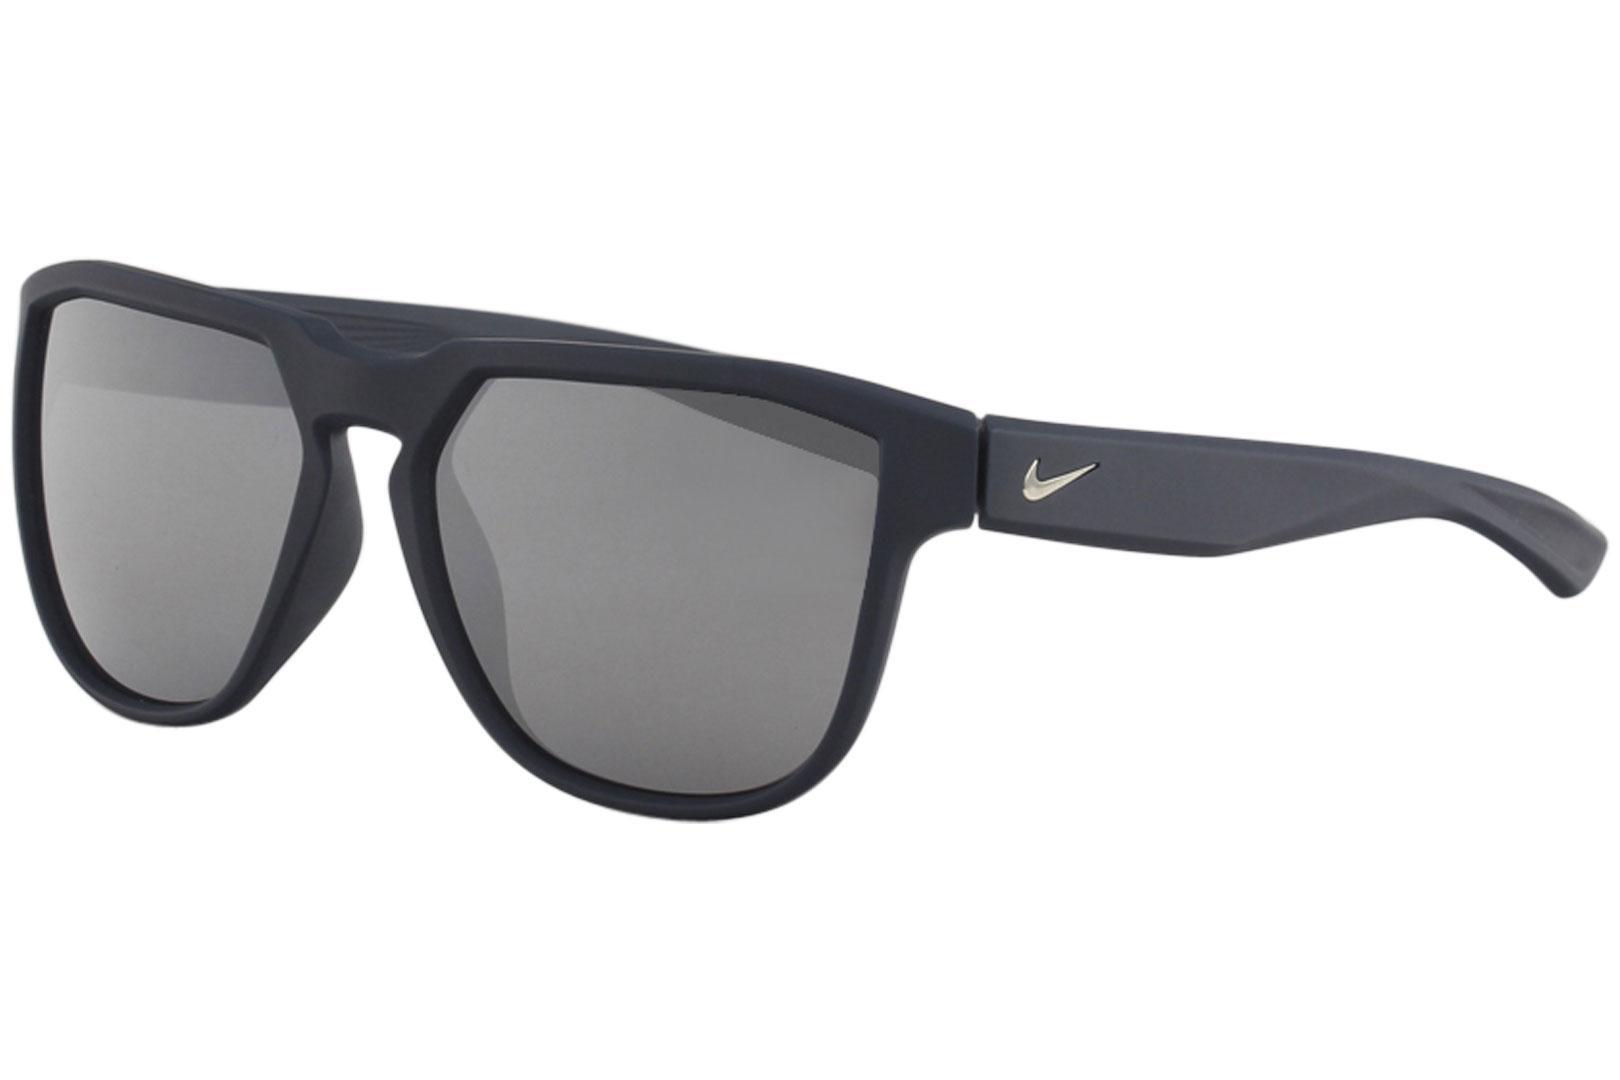 8e88602c7a685 UPC 886549076191 product image for Nike Men s Fly Swift Sport Square  Sunglasses